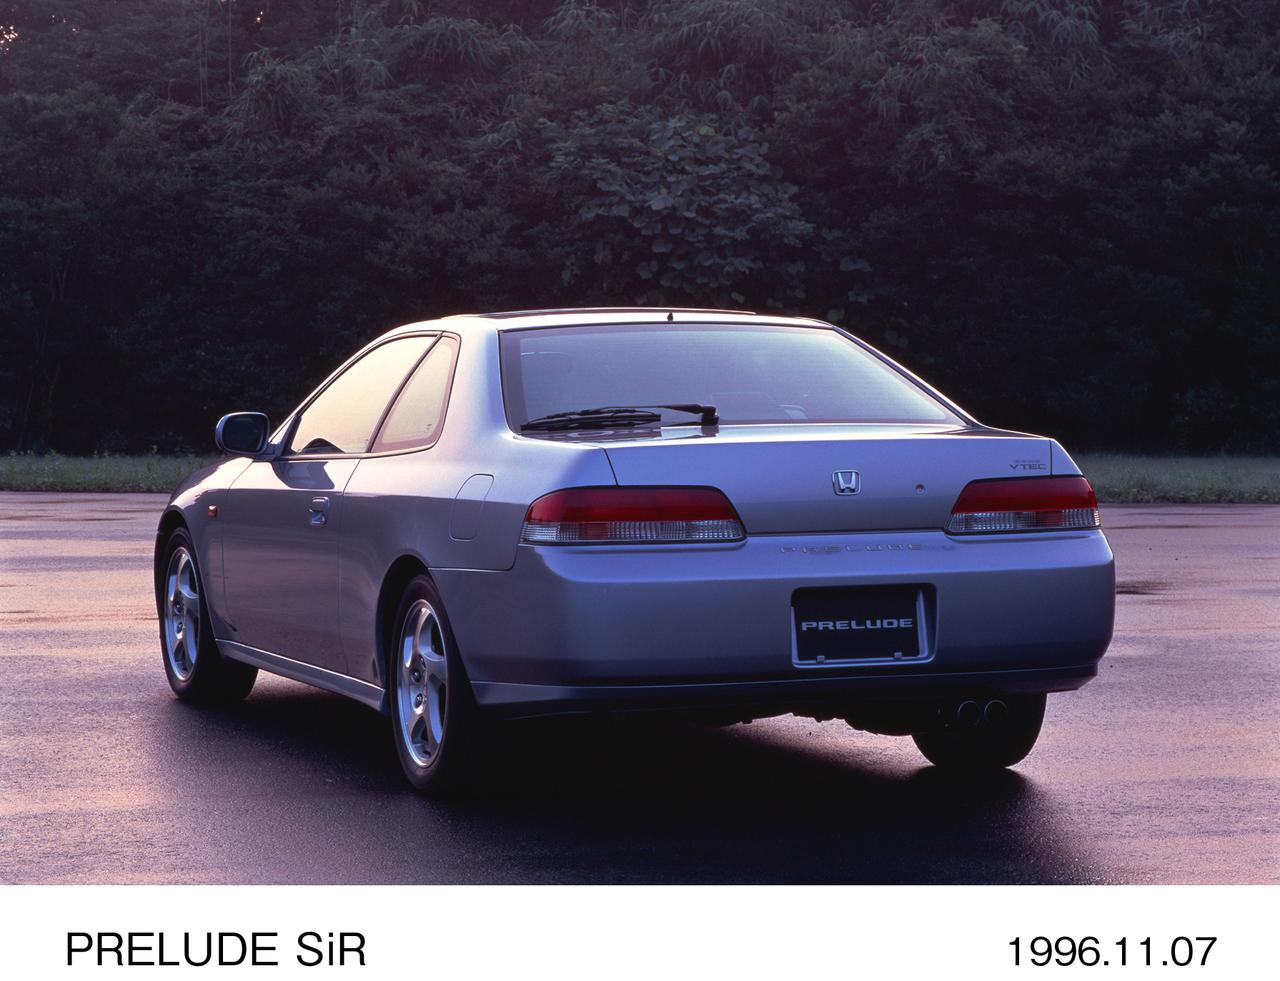 Images : 8番目の画像 - ホンダ プレリュード関連画像(クリックして拡大) - A Little Honda | ア・リトル・ホンダ(リトホン)